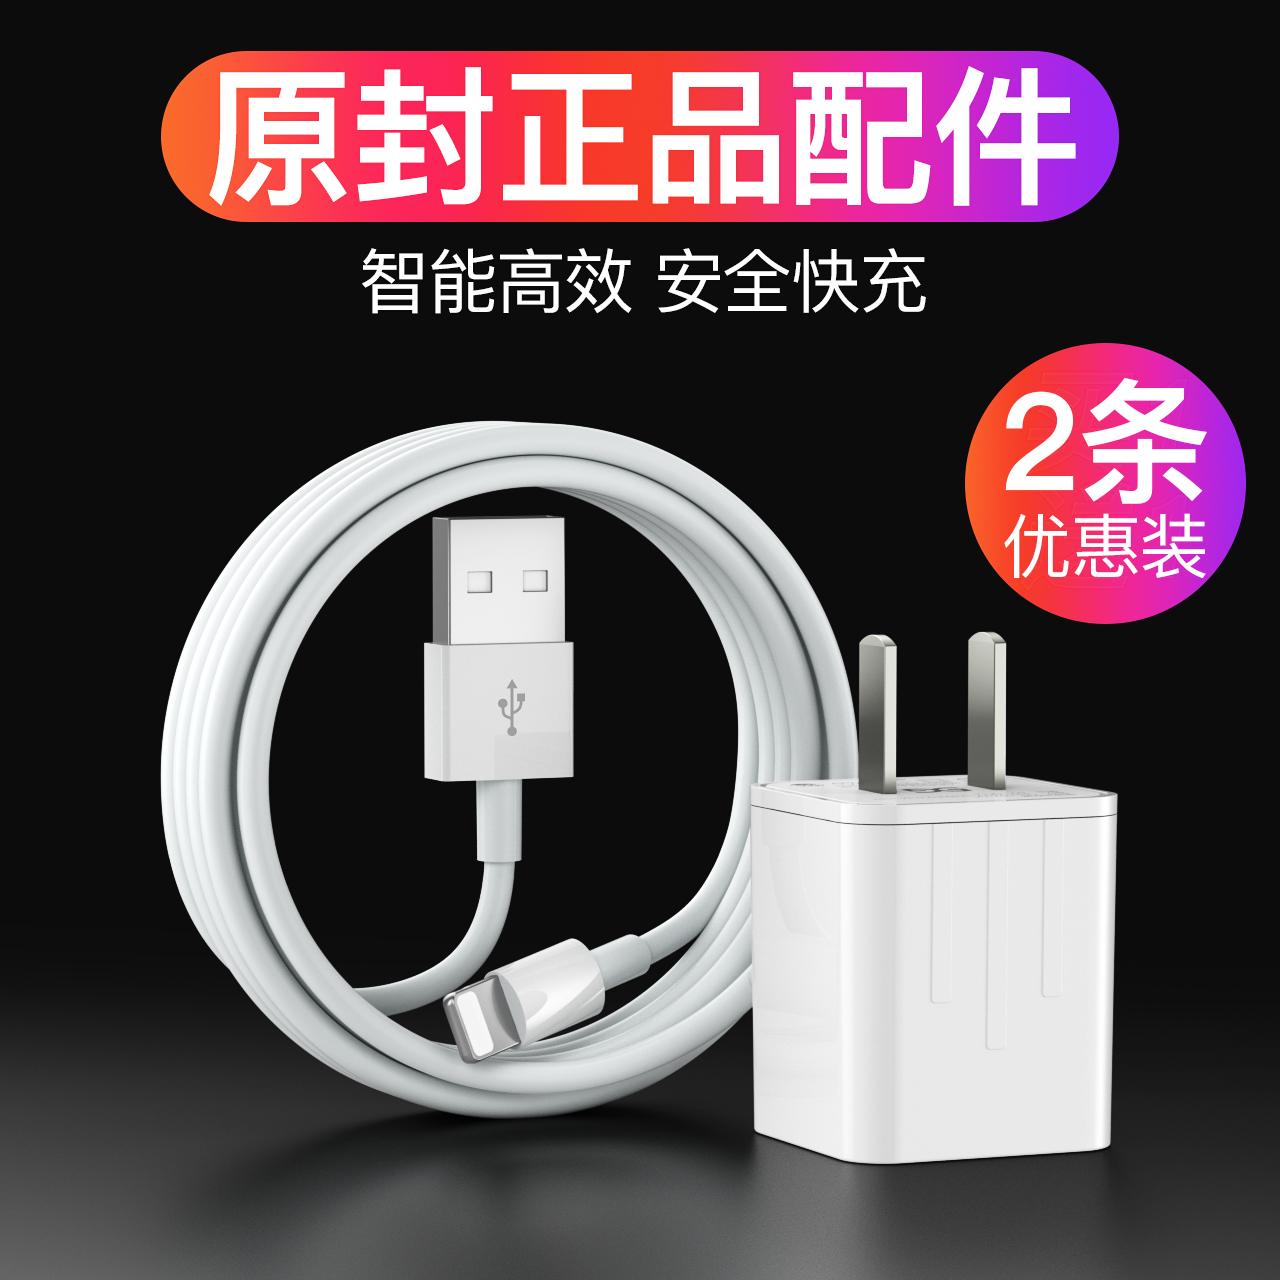 iphone6苹果6s x充电线器六数据线11月06日最新优惠